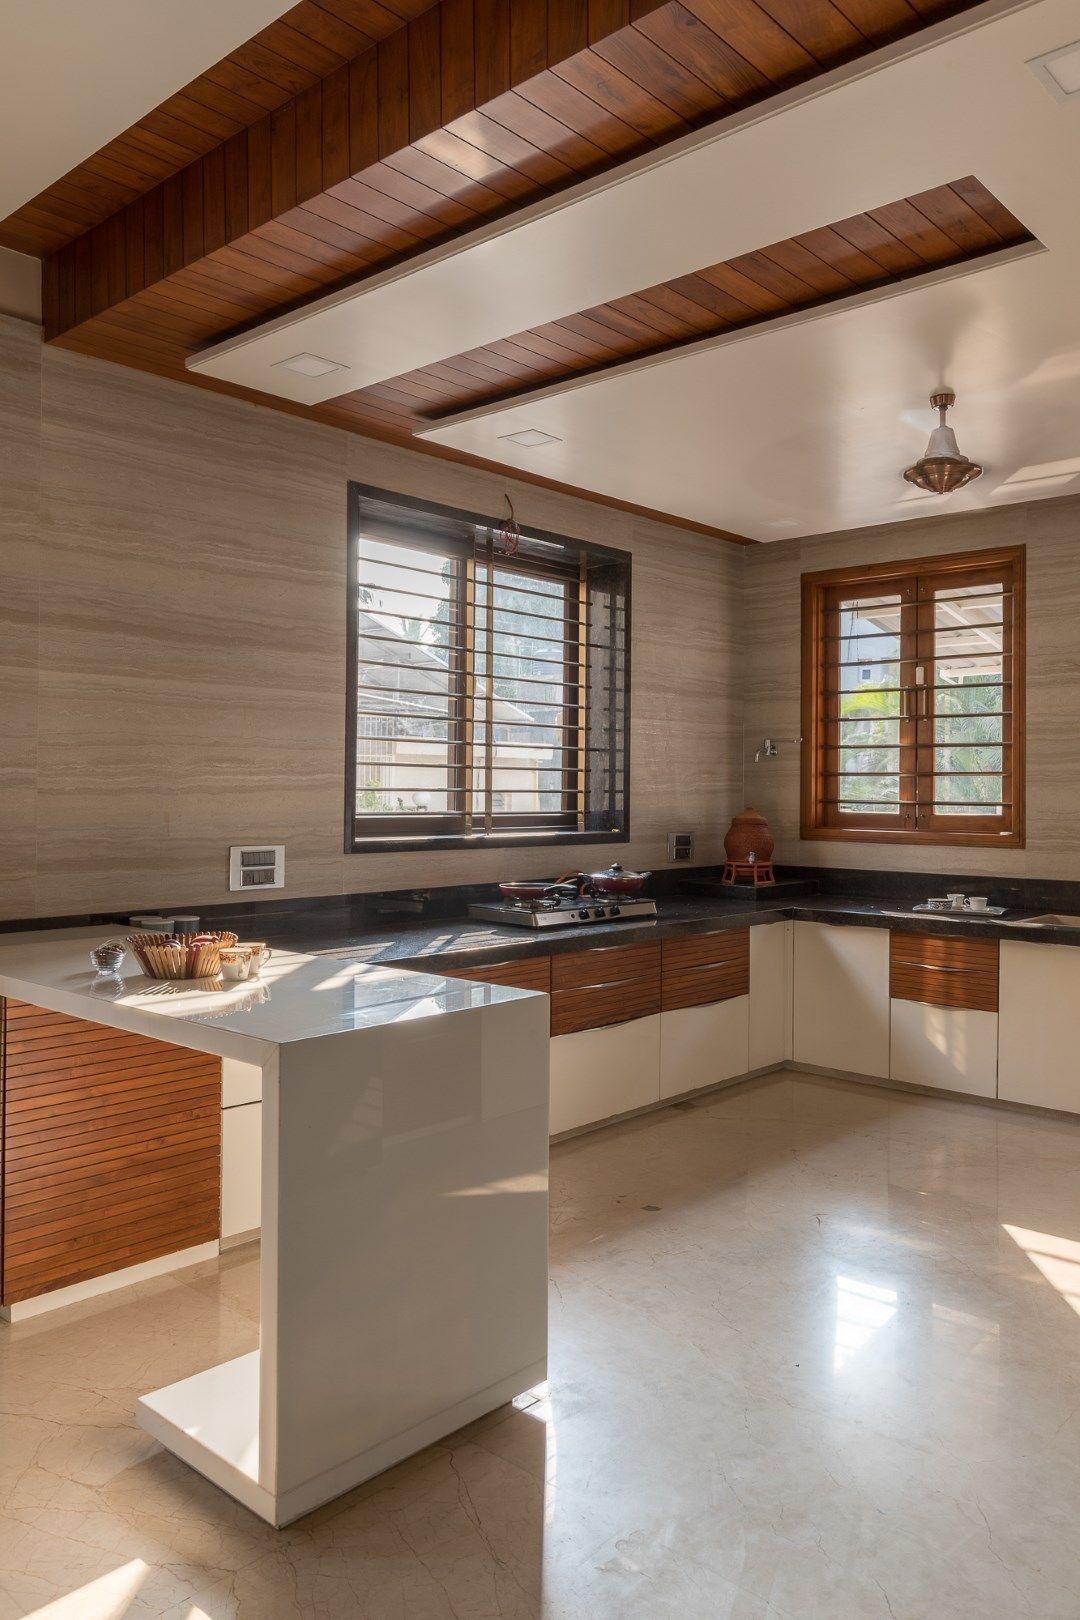 Kitchen Ceiling Ideas Vaulted And 3d Drop Ceiling In 2020 Kitchen Room Design Kitchen Furniture Design Interior Design Kitchen